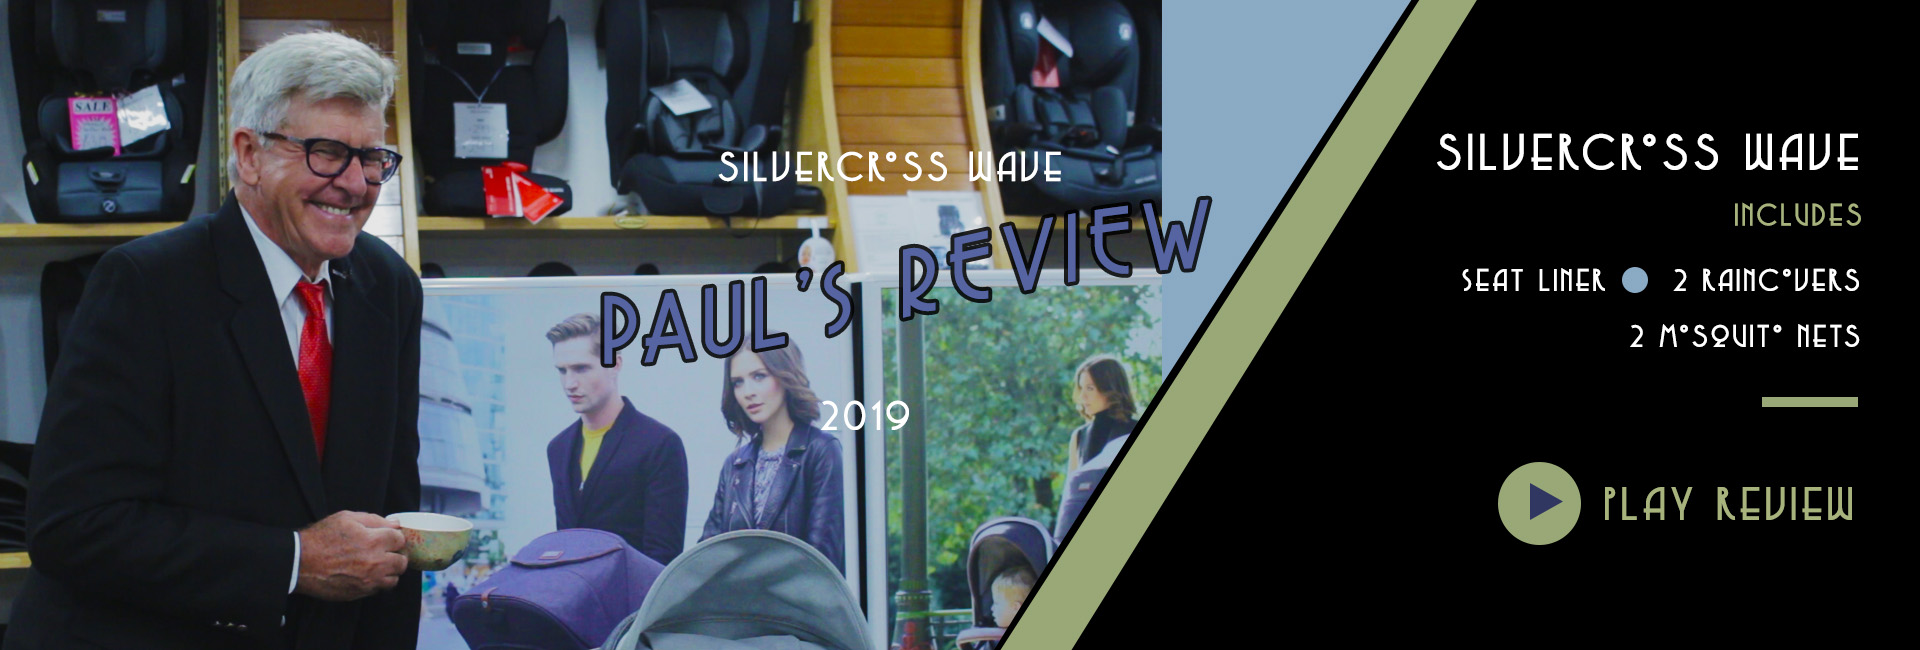 silvercross wave version 3 review